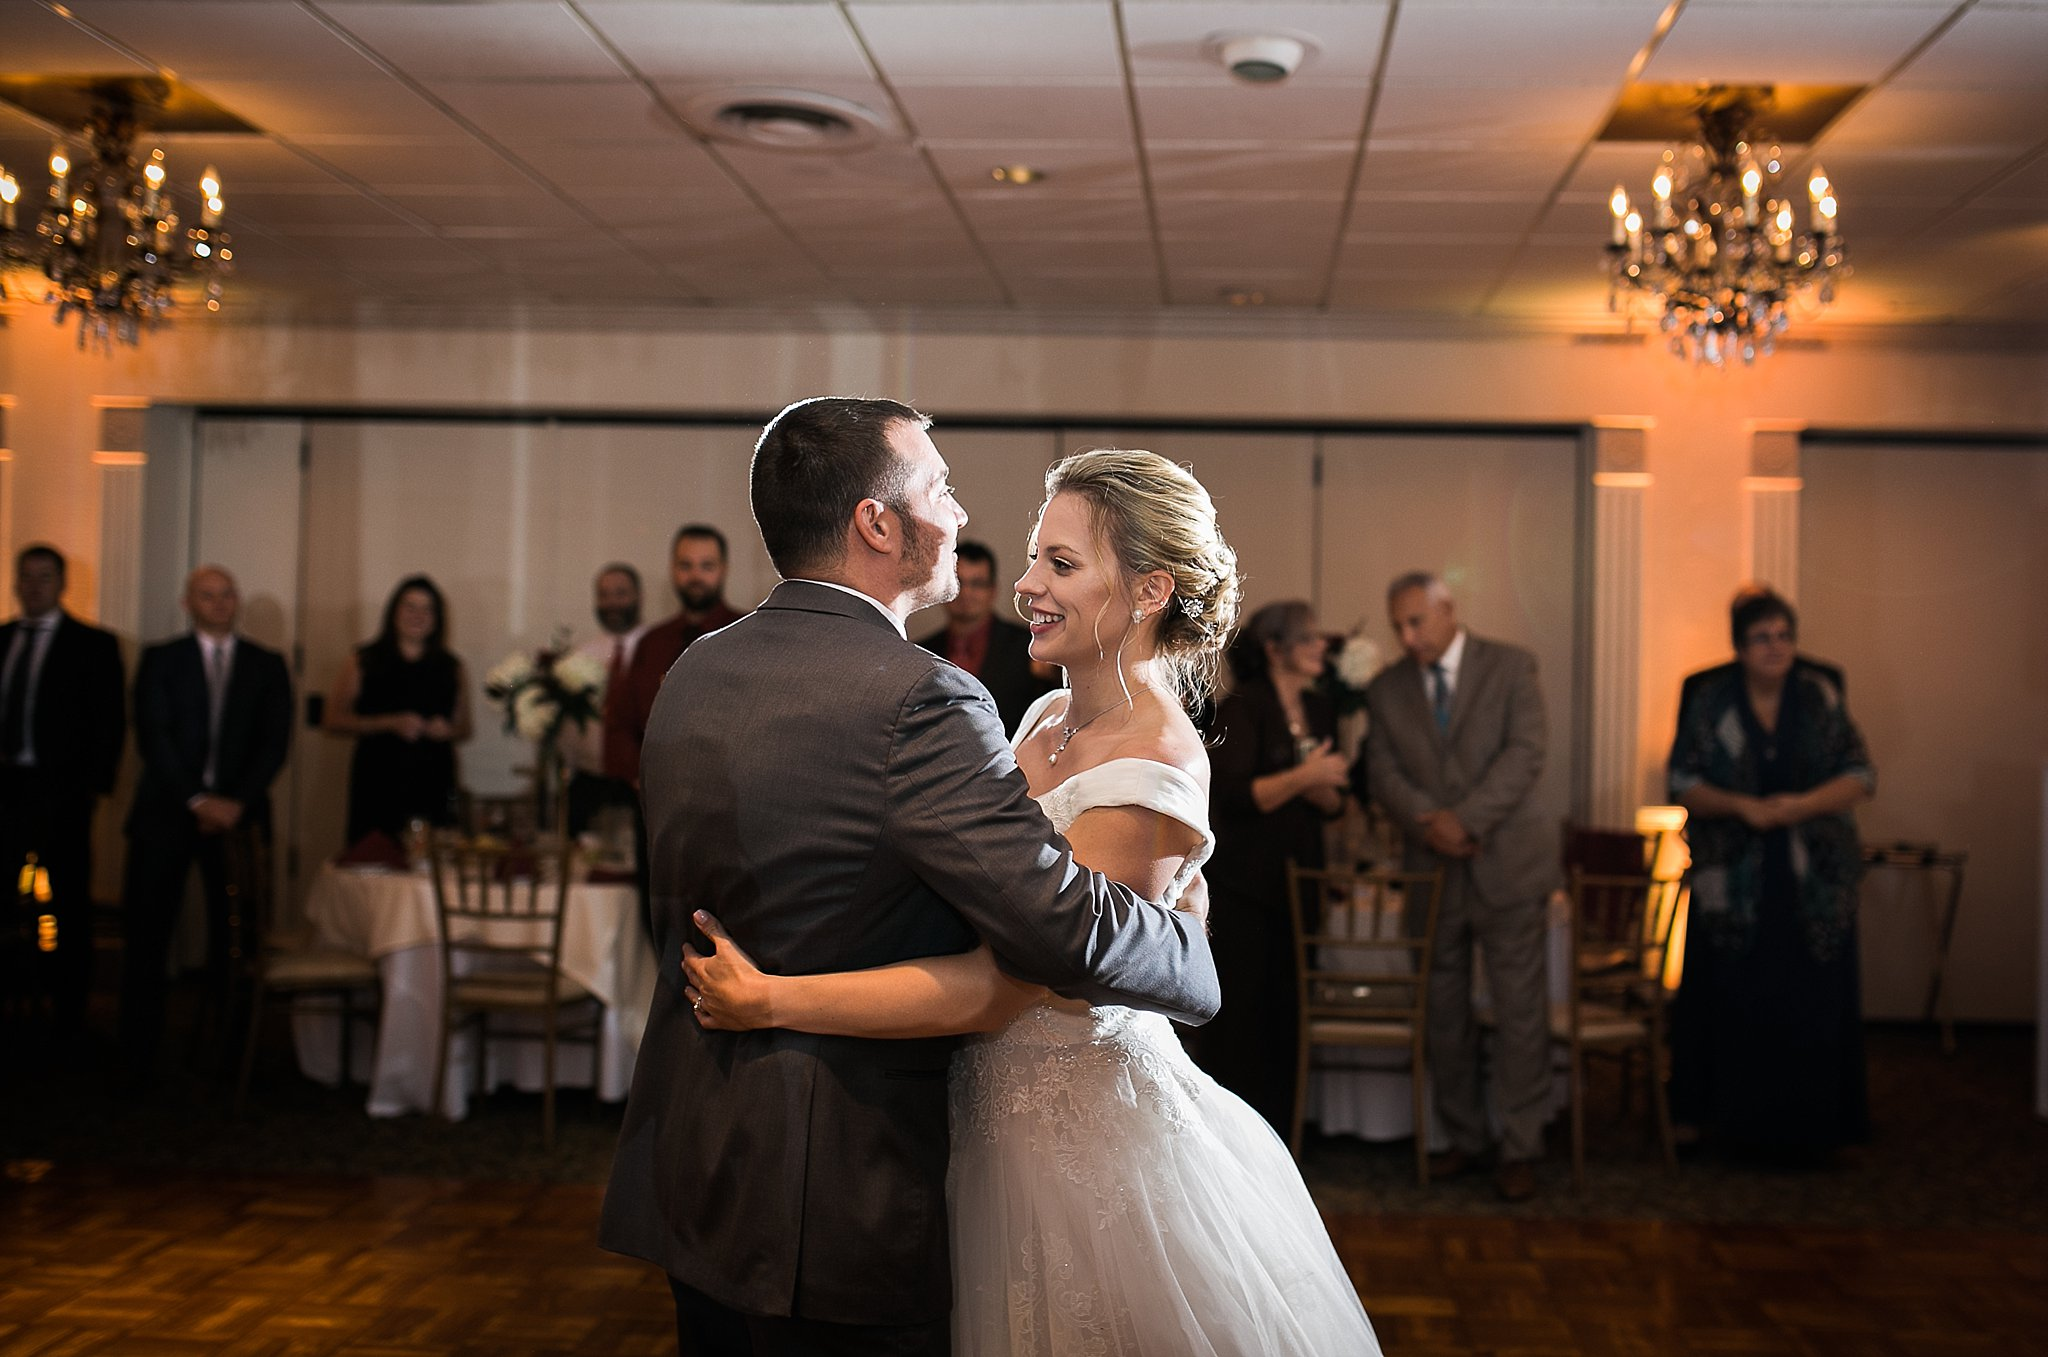 New Windsor New York Hudson Valley New York Wedding Photographer 65.jpg